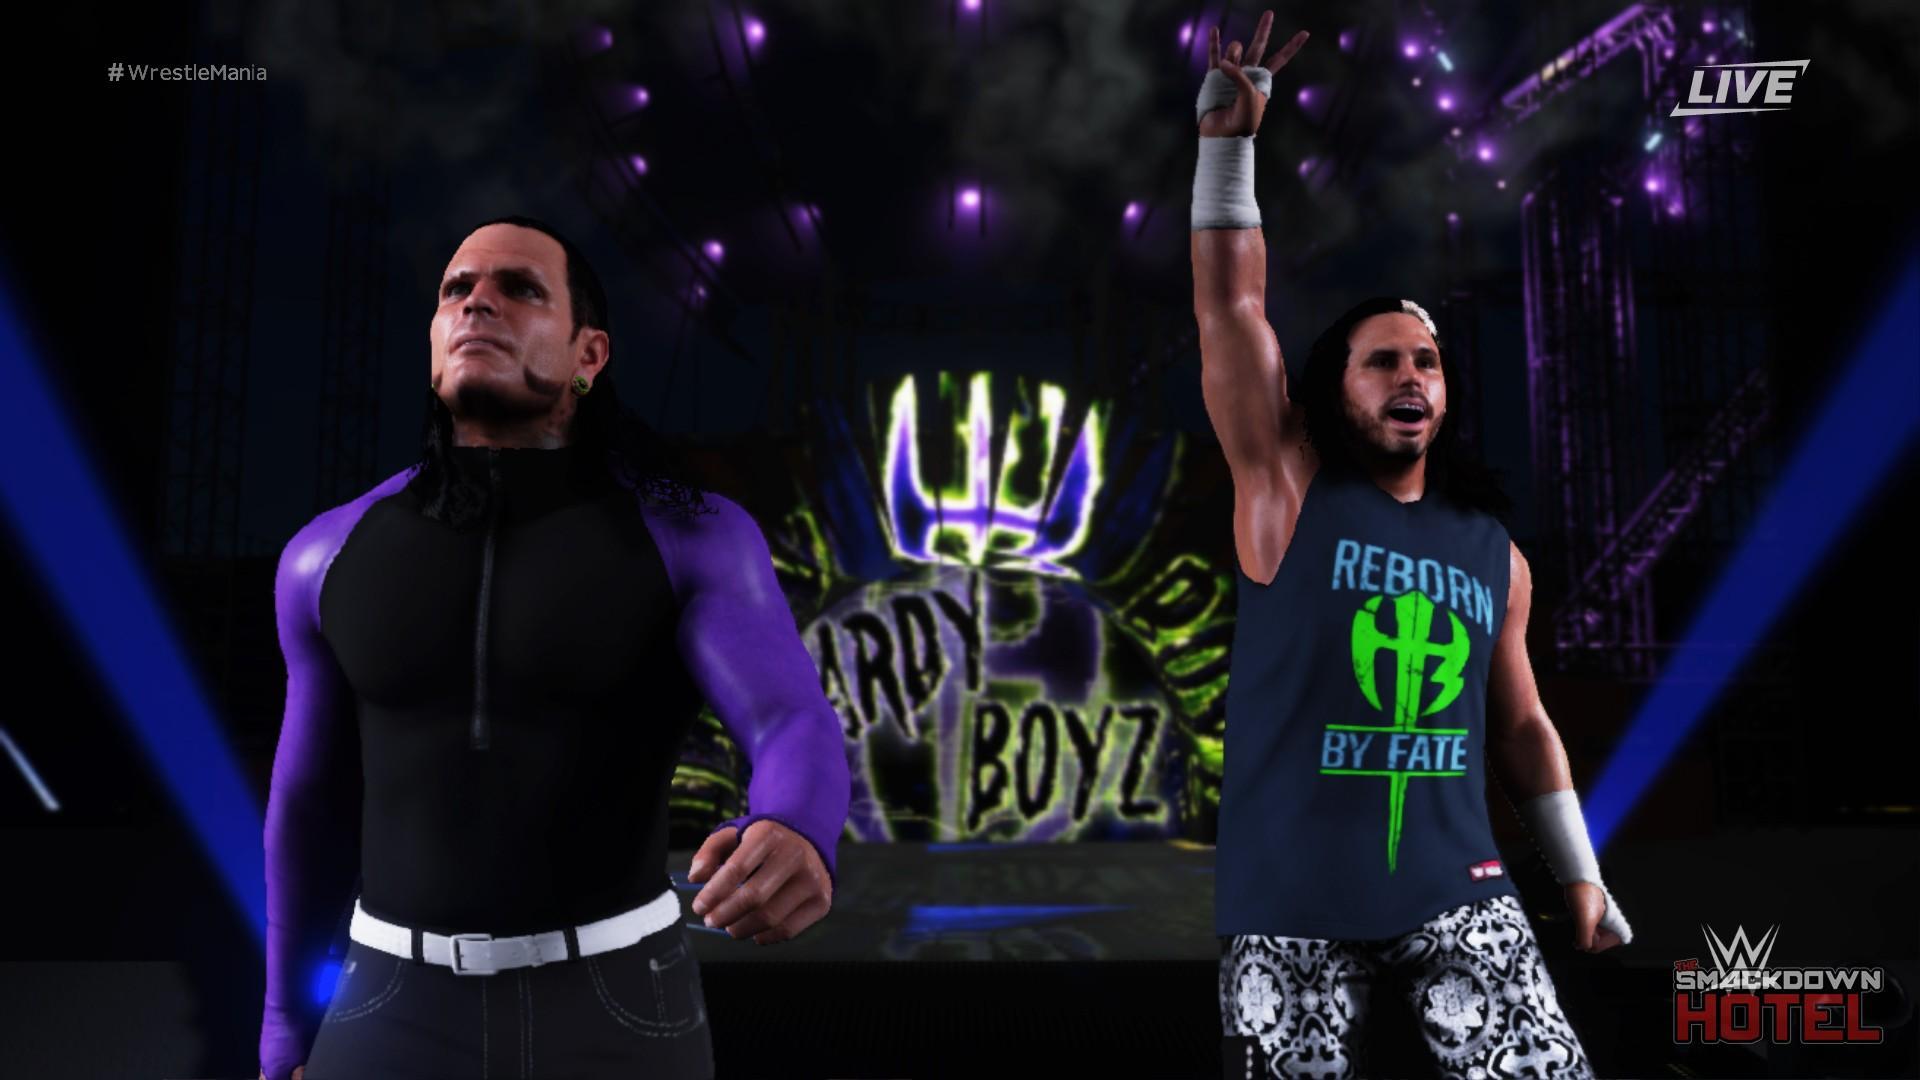 Jeff Hardy WWE 2K18 Roster